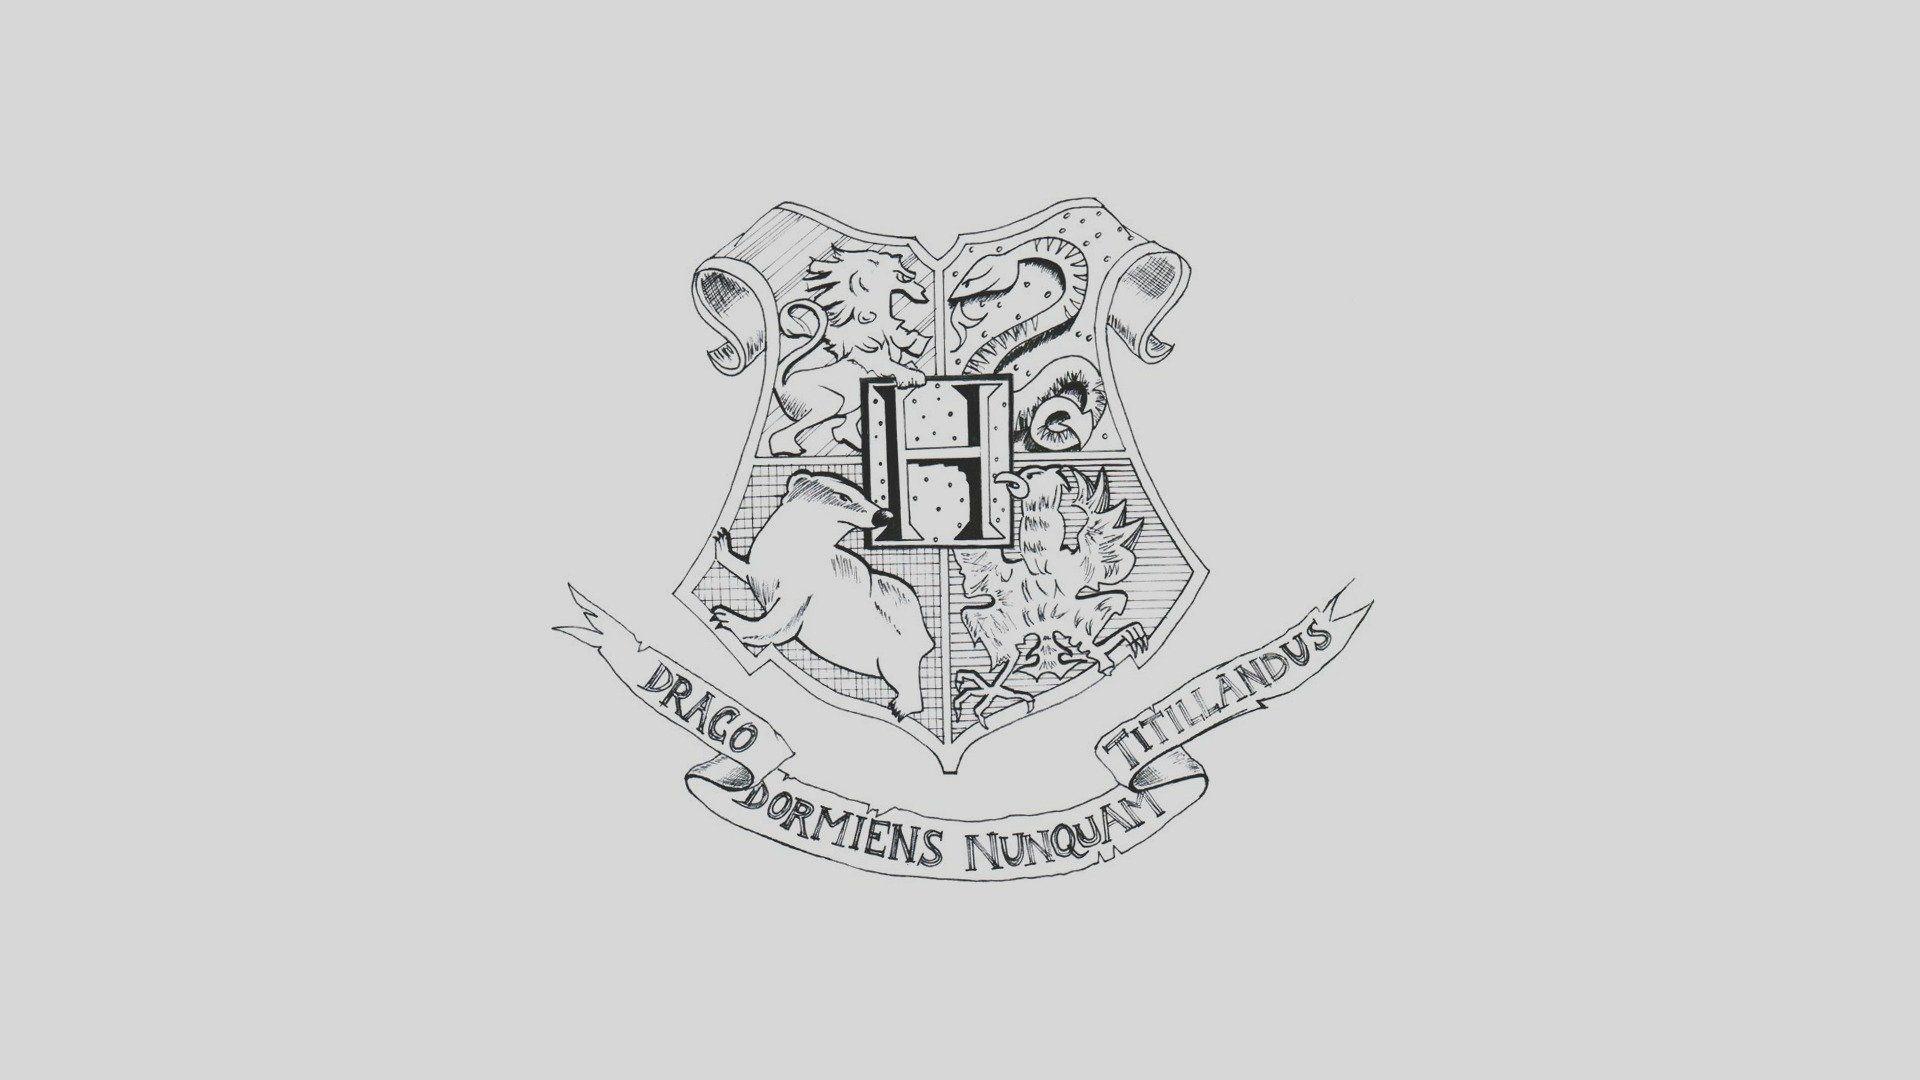 Hogwards Hogwarts Gaara Potter Coat Of Arms Coat Hogvrtsa Harry Potter Harry Potter Wallpaper Backgrounds Desktop Wallpaper Harry Potter Harry Potter Wallpaper